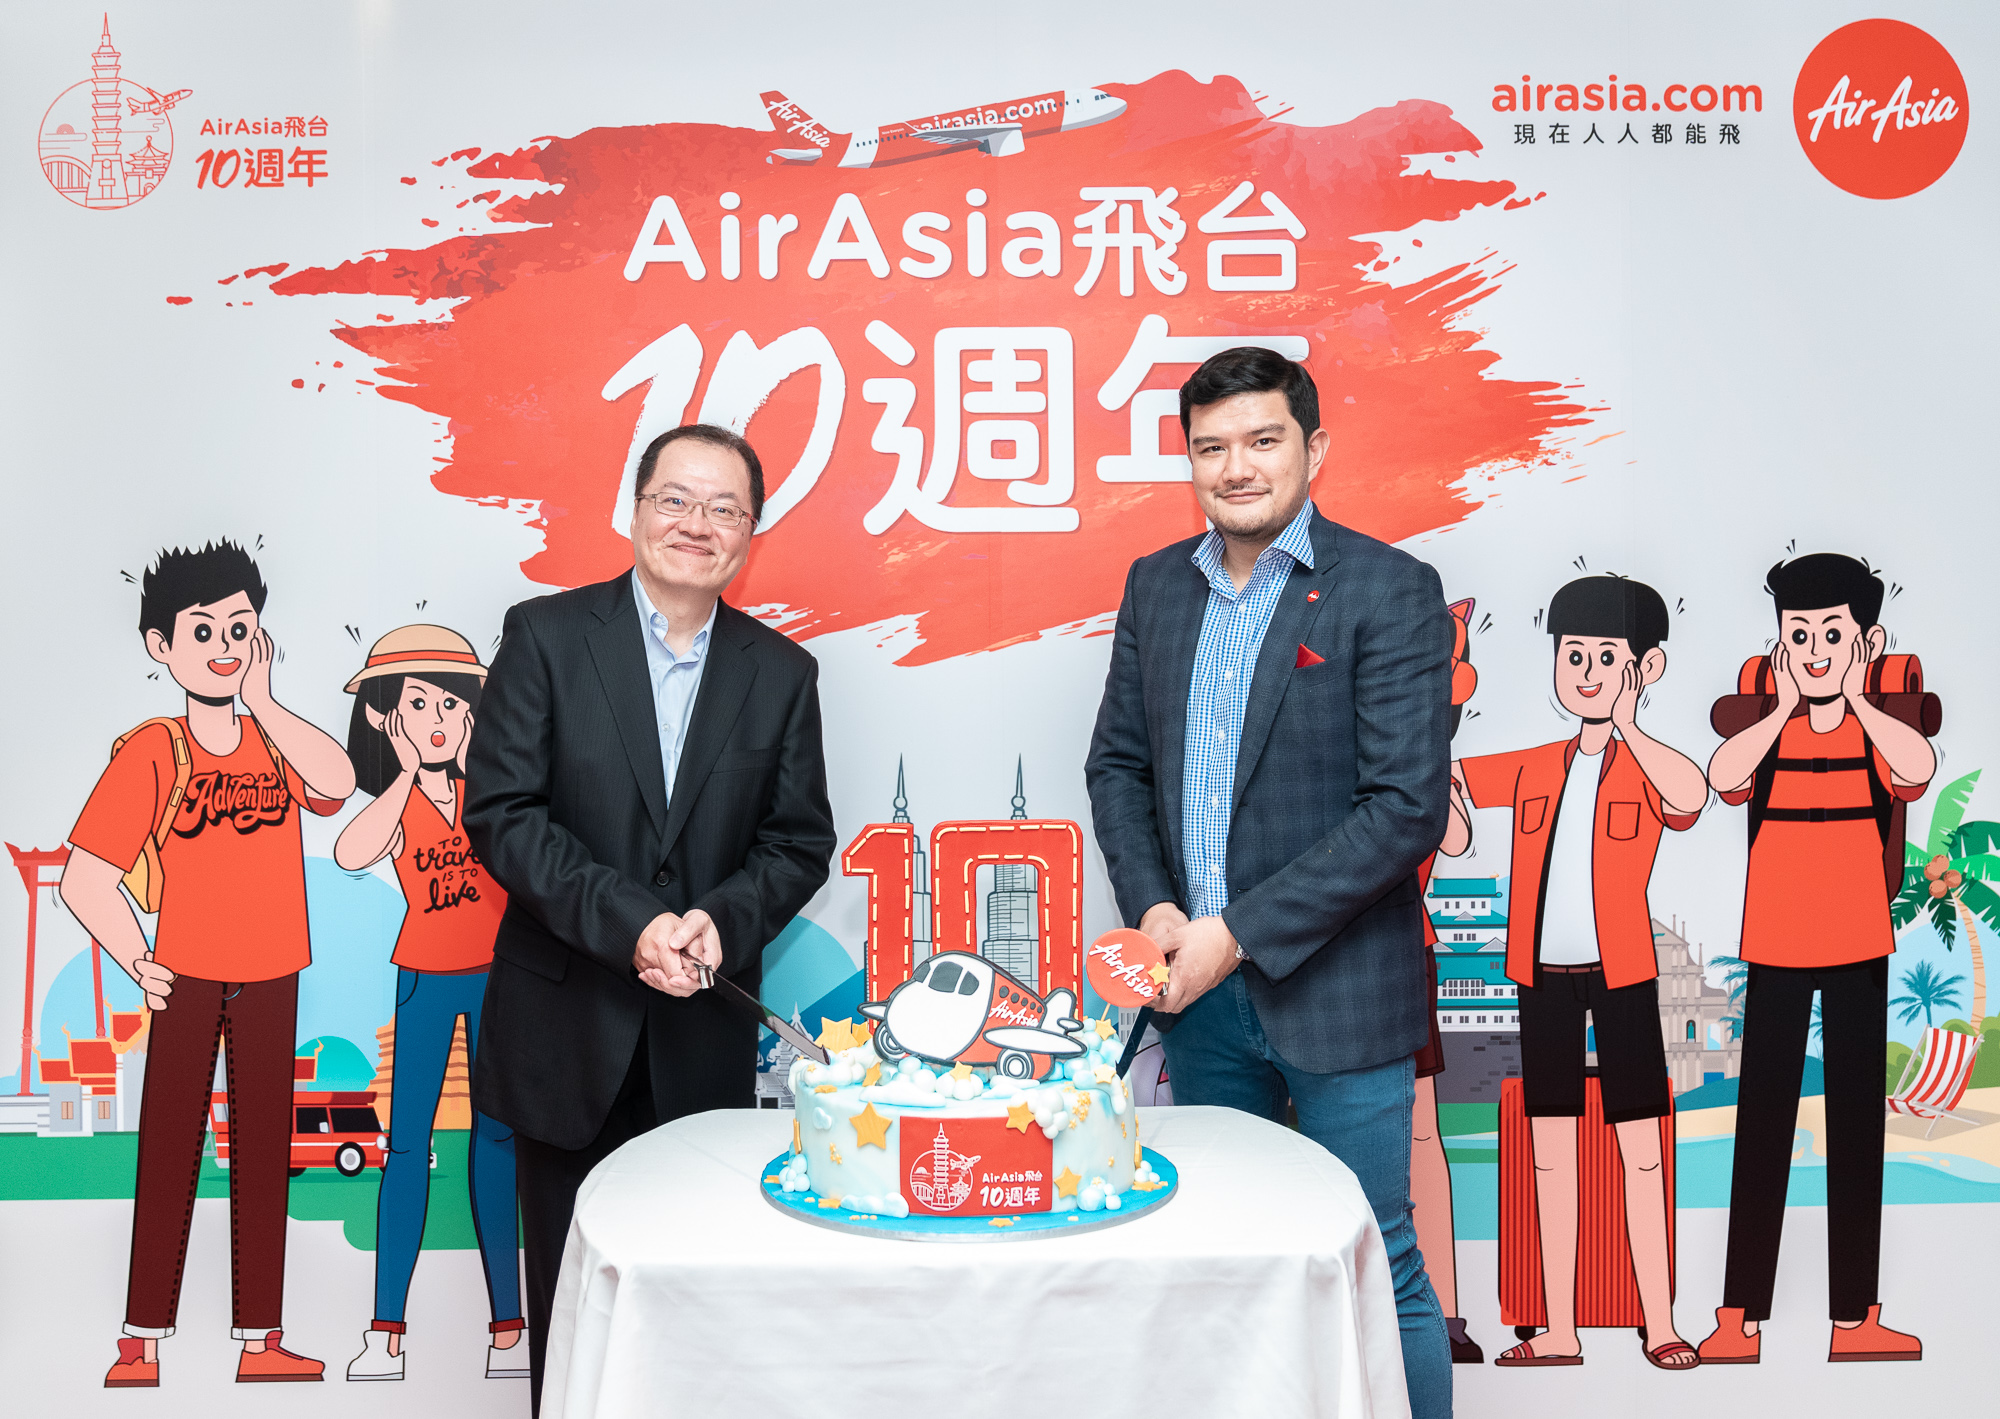 AirAsia爲慶祝「台北-吉隆坡」開航10週年,將於明日(821)早上10點至8月25日2359推出台北高雄直飛航線單程未稅1,088元起促銷價,可購買即日起至2020年2月29日前出發的機票 - Copy.jpg